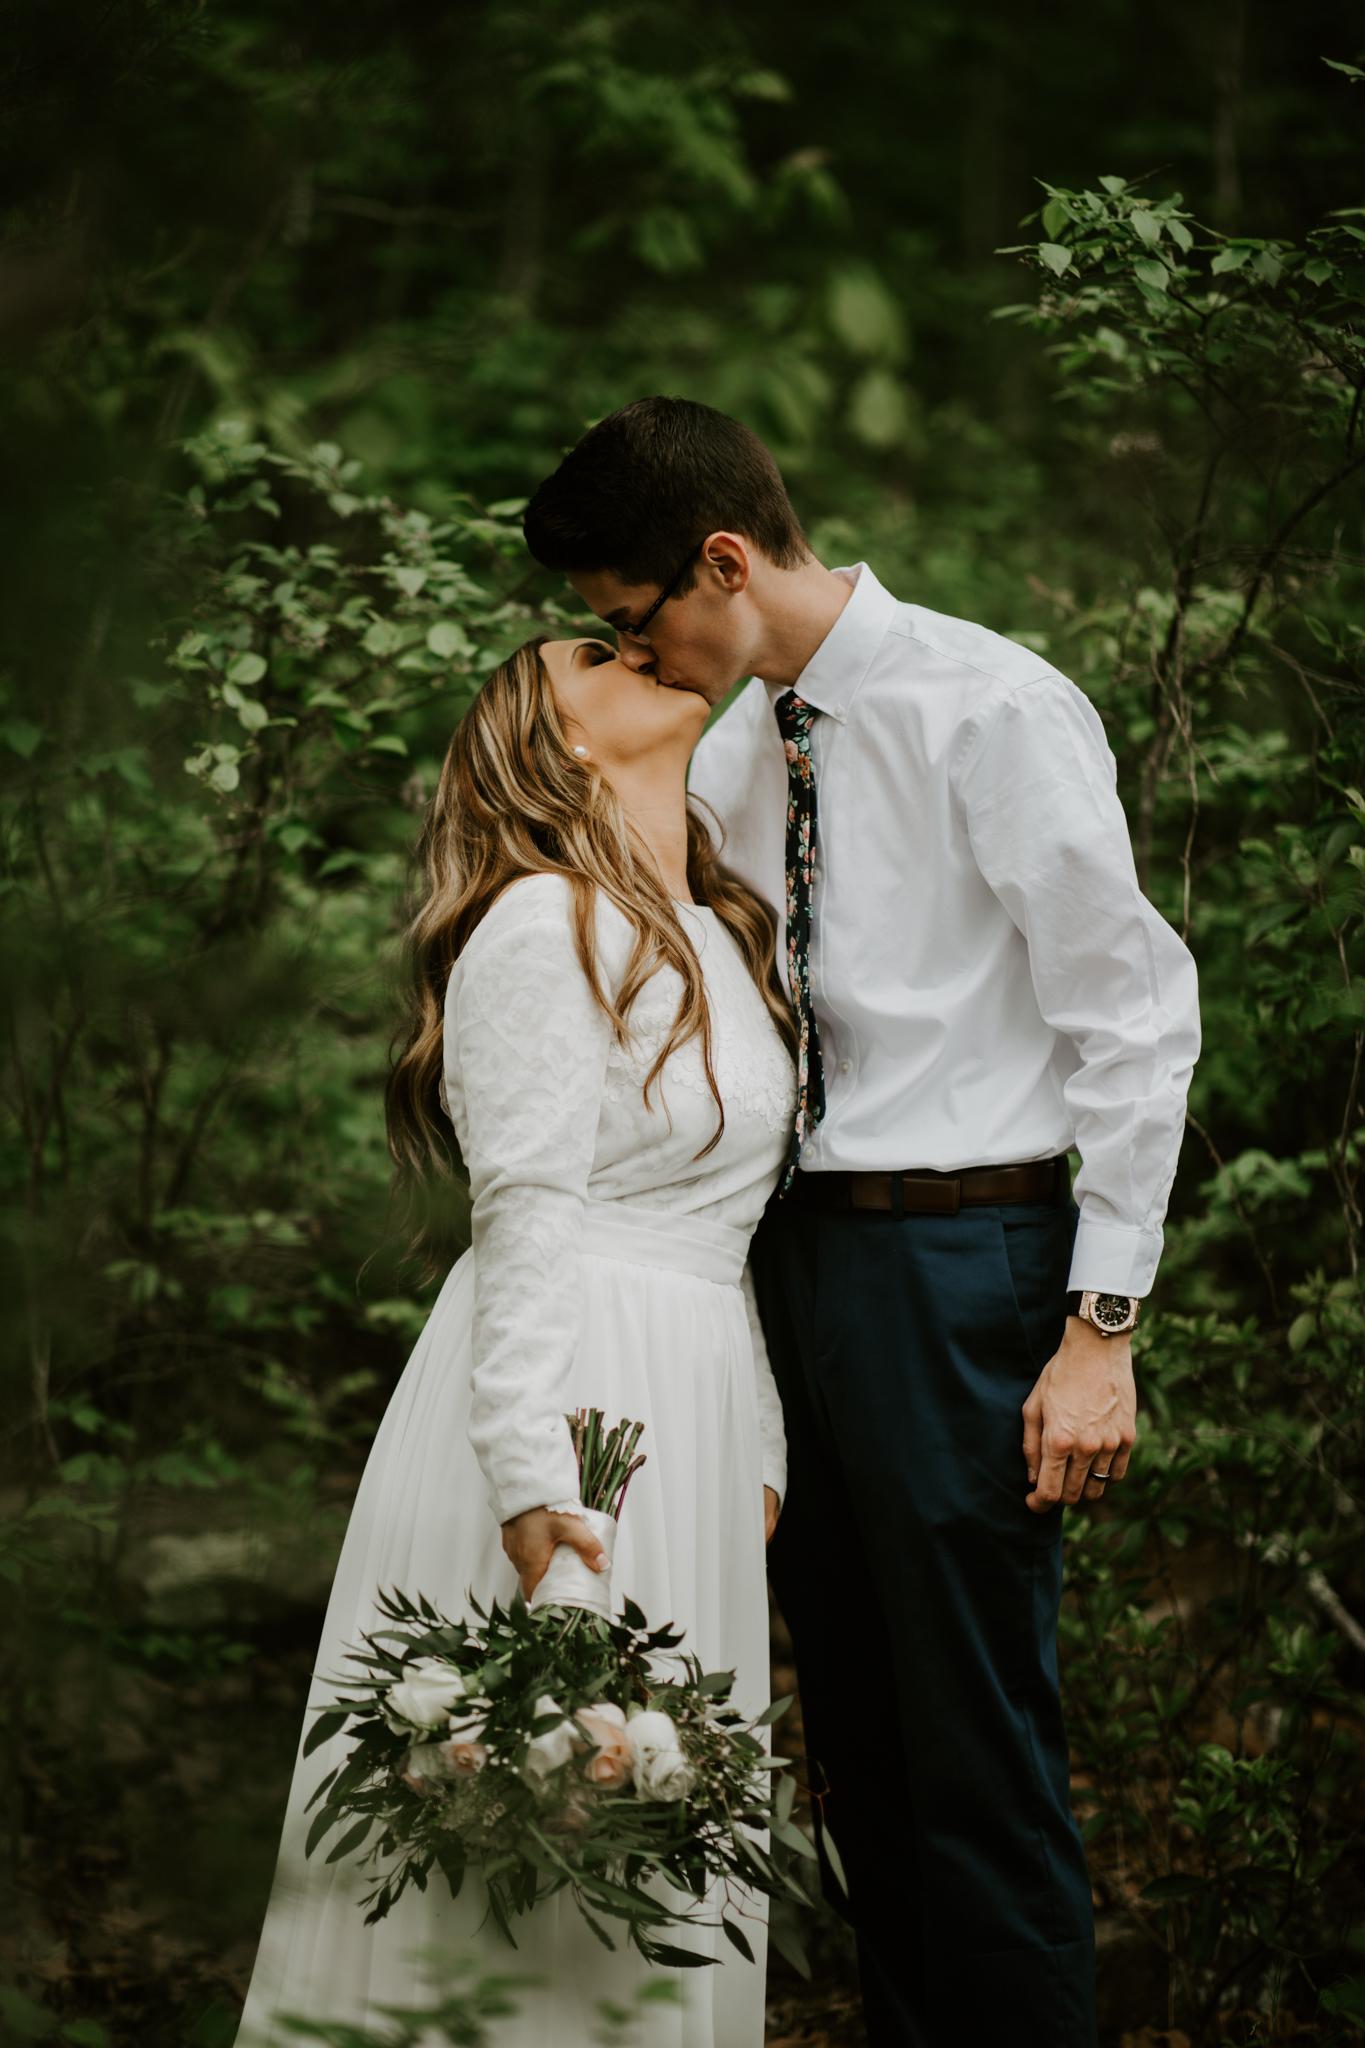 Lacey-Joe-Chattanooga-Nashville-Tennessee-Wedding-Elopement-Photographer-148.jpg